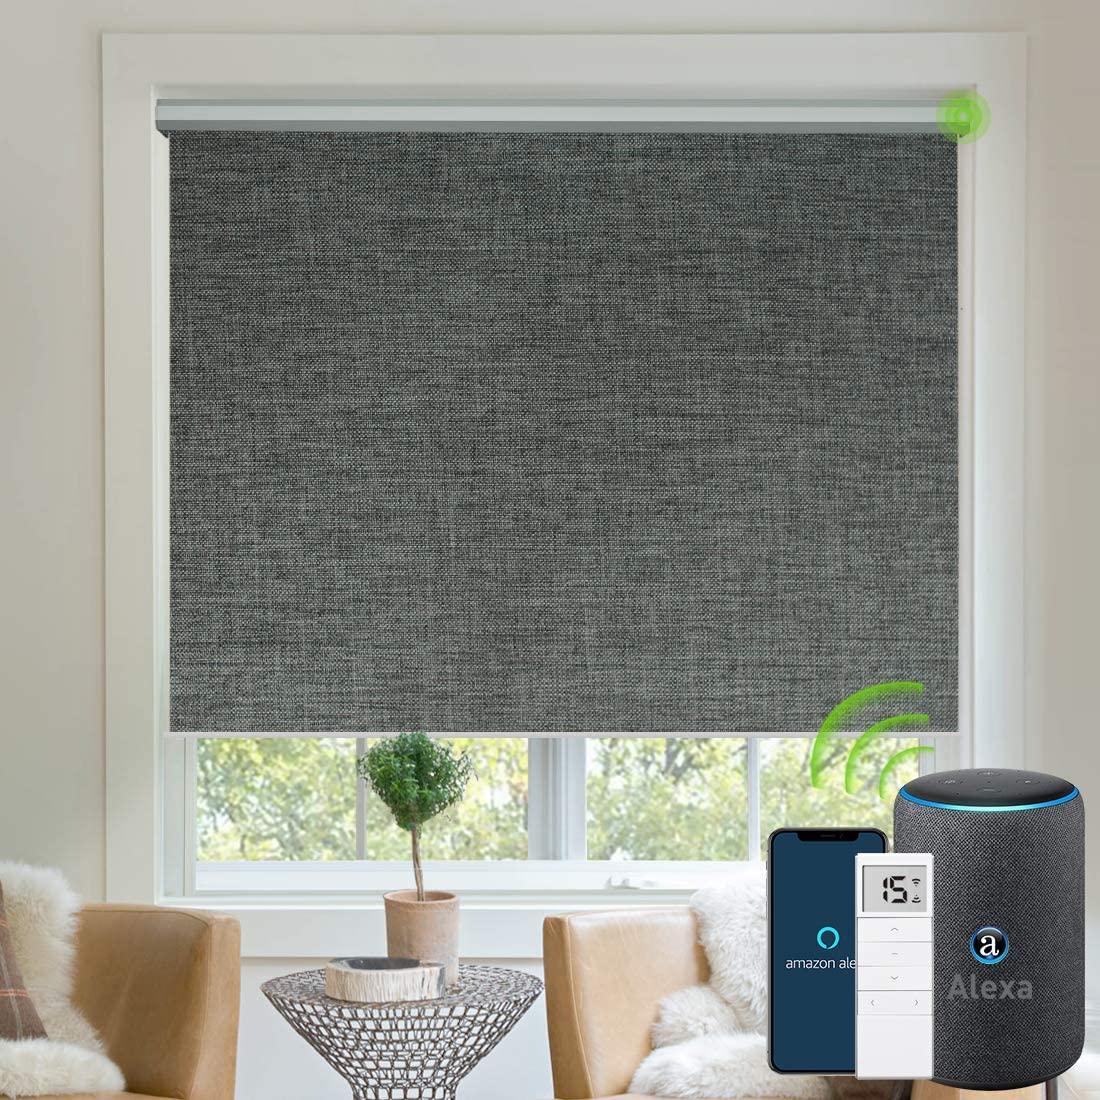 Blind & Curtain Automation